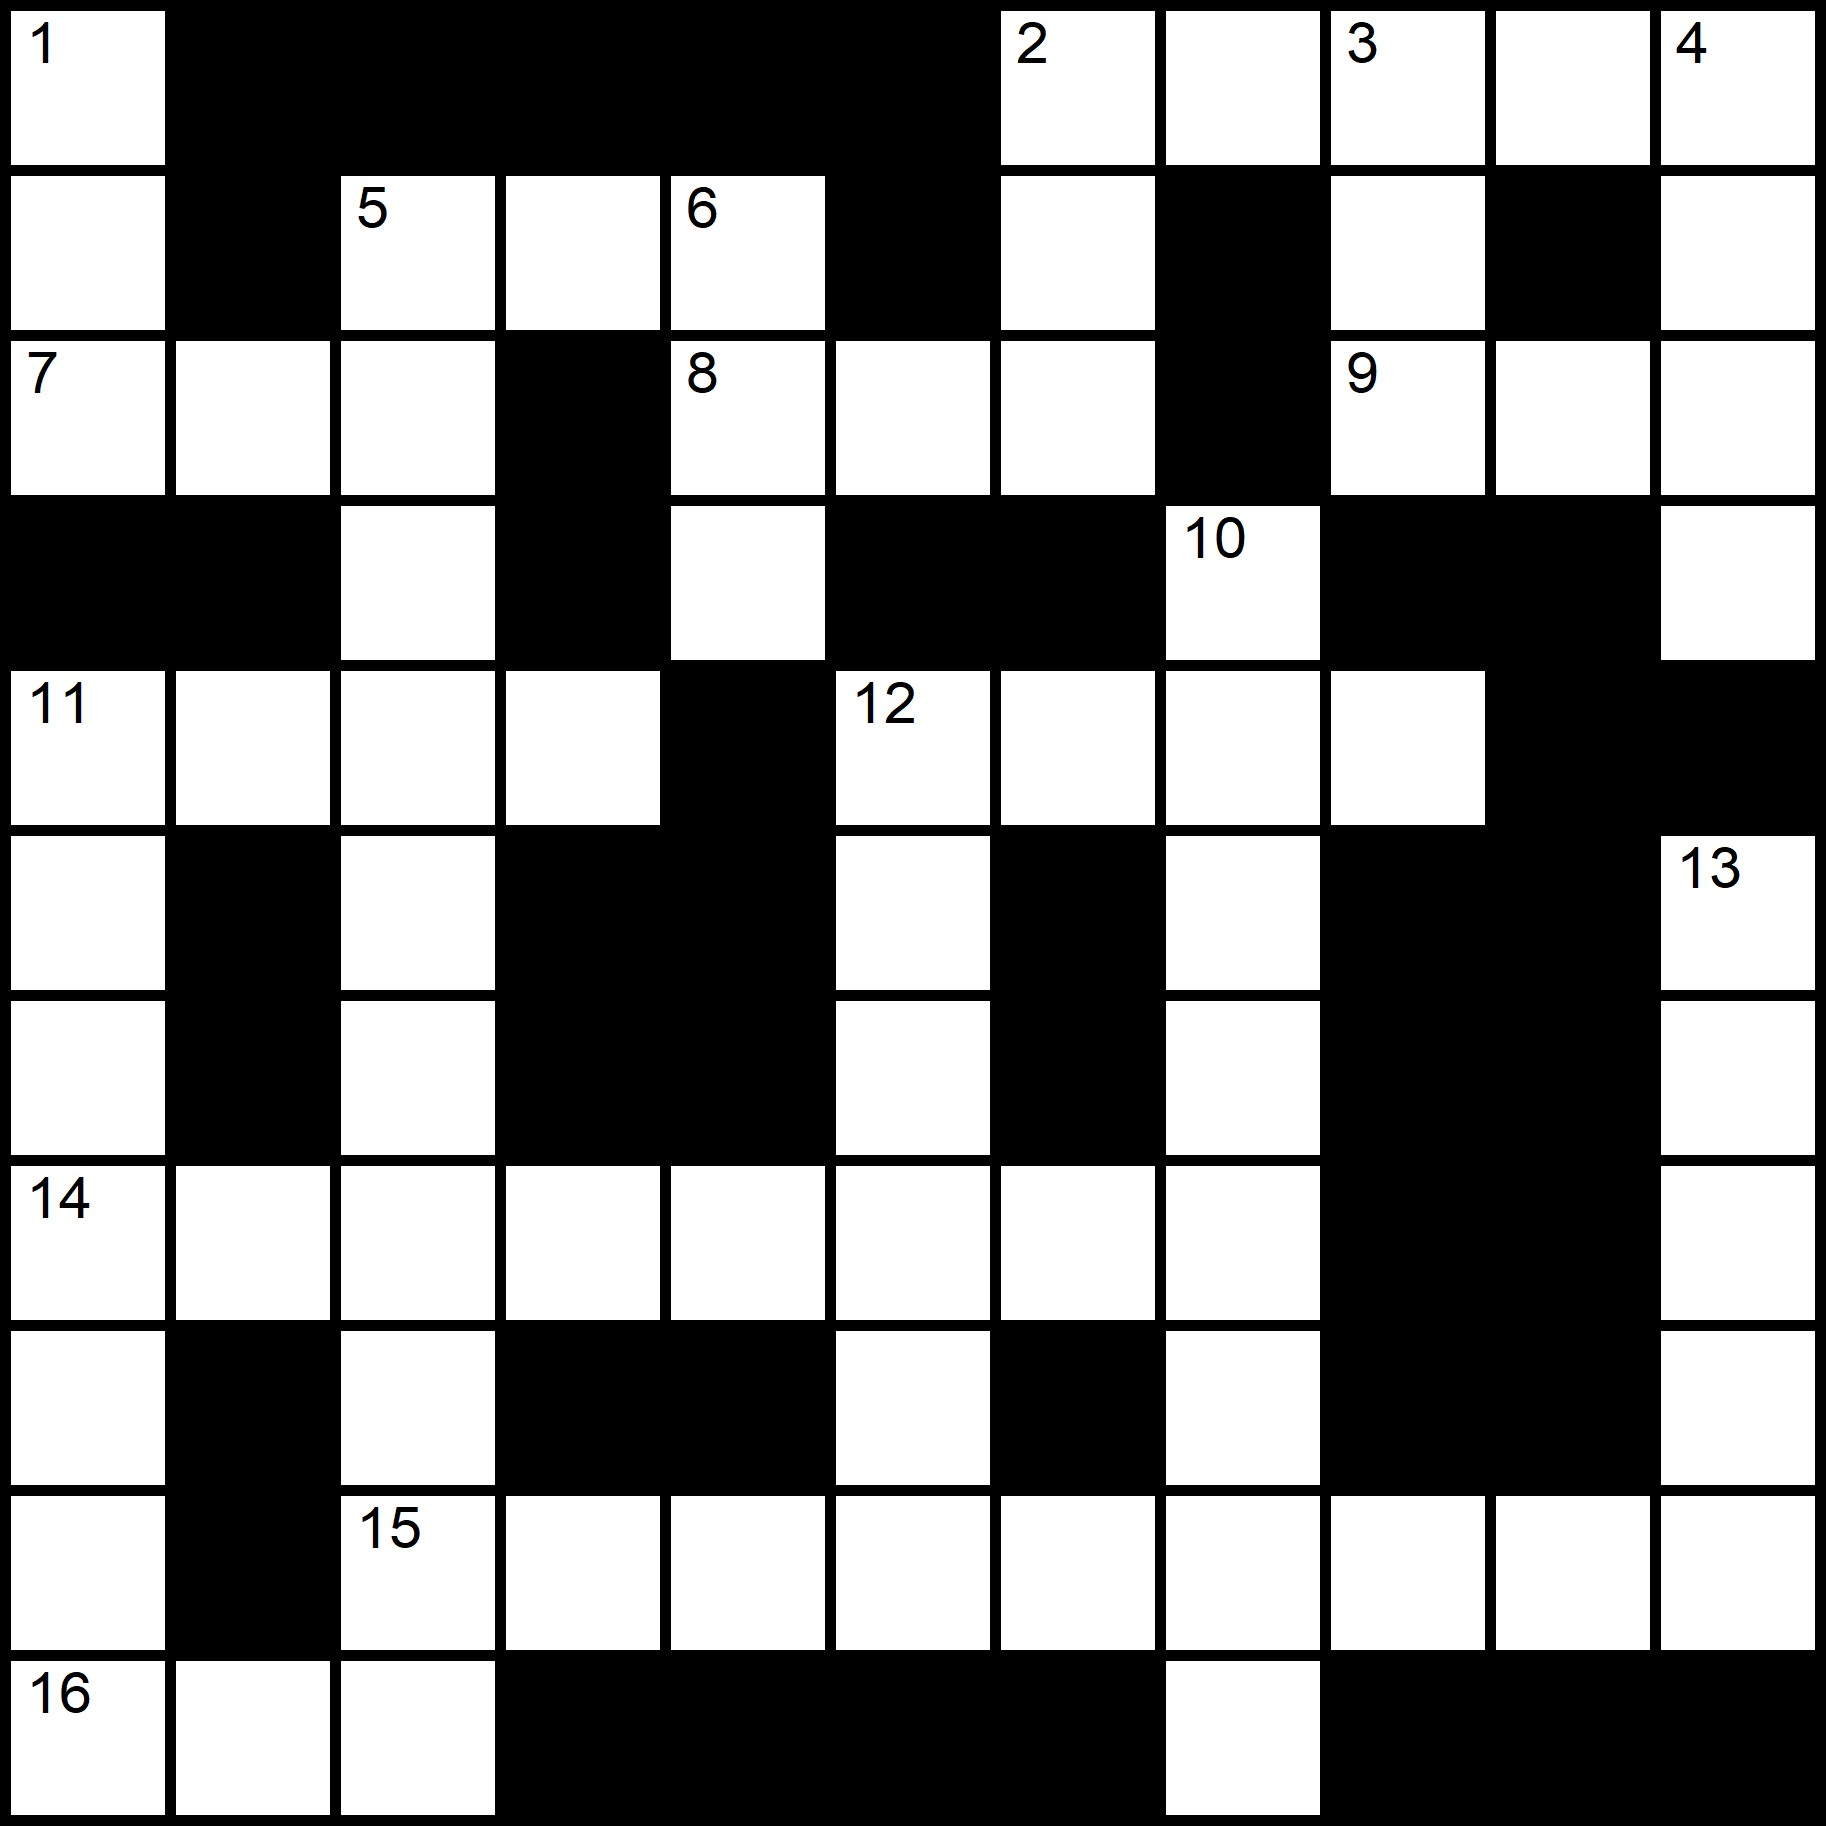 Free And Printable Crosswords In English - Placidus Flora - Crossword number twenty-seven